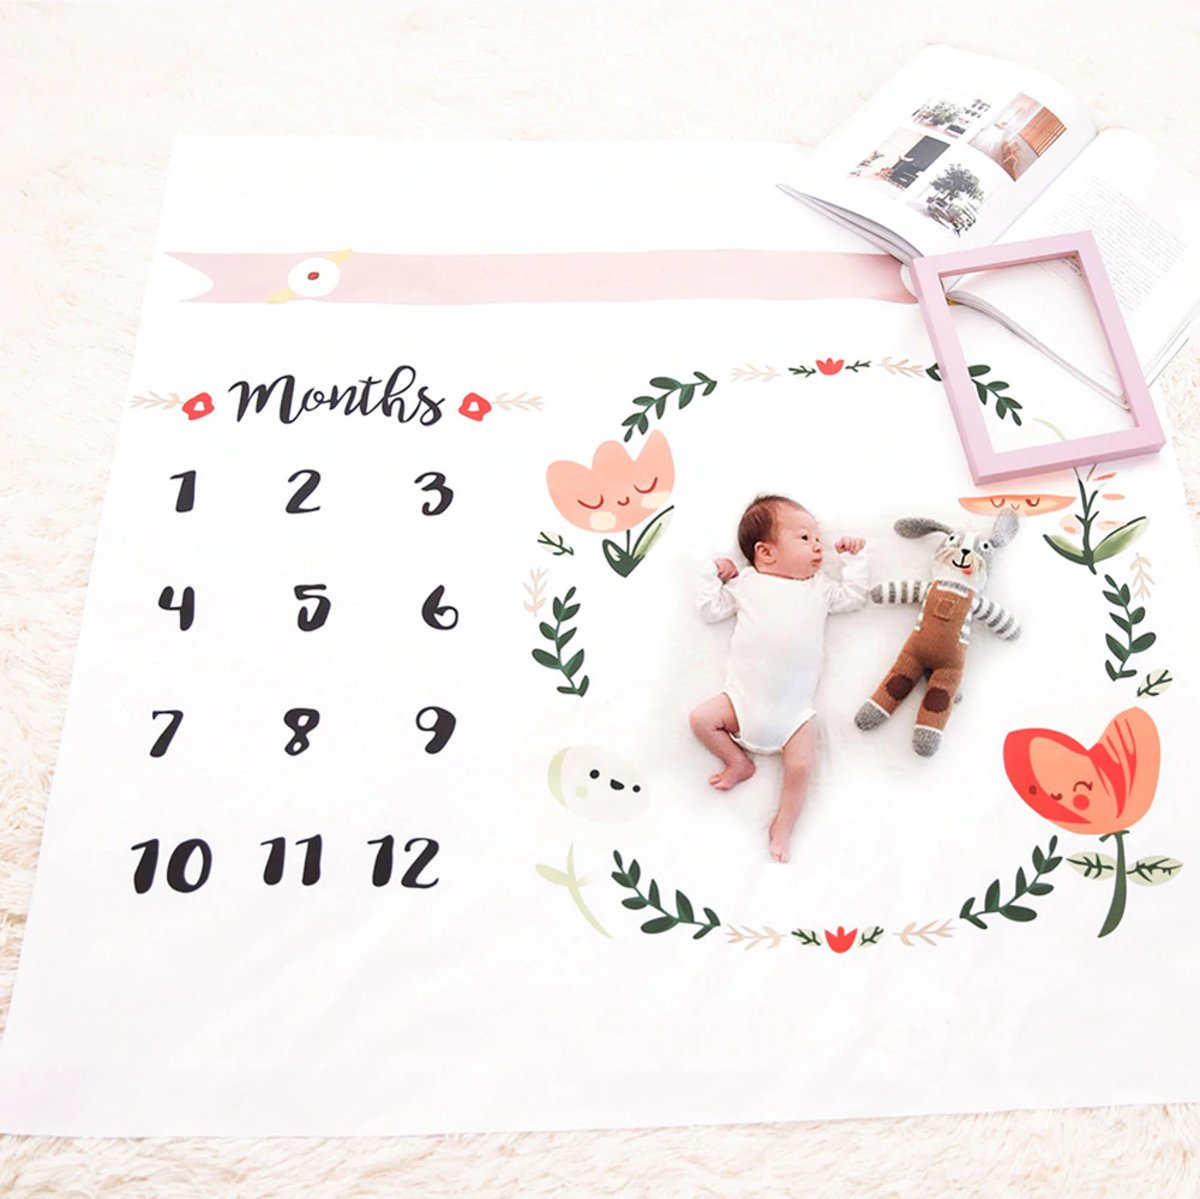 Mijlpaaldeken baby, milestone blanket, kraamkado, mijlpalen